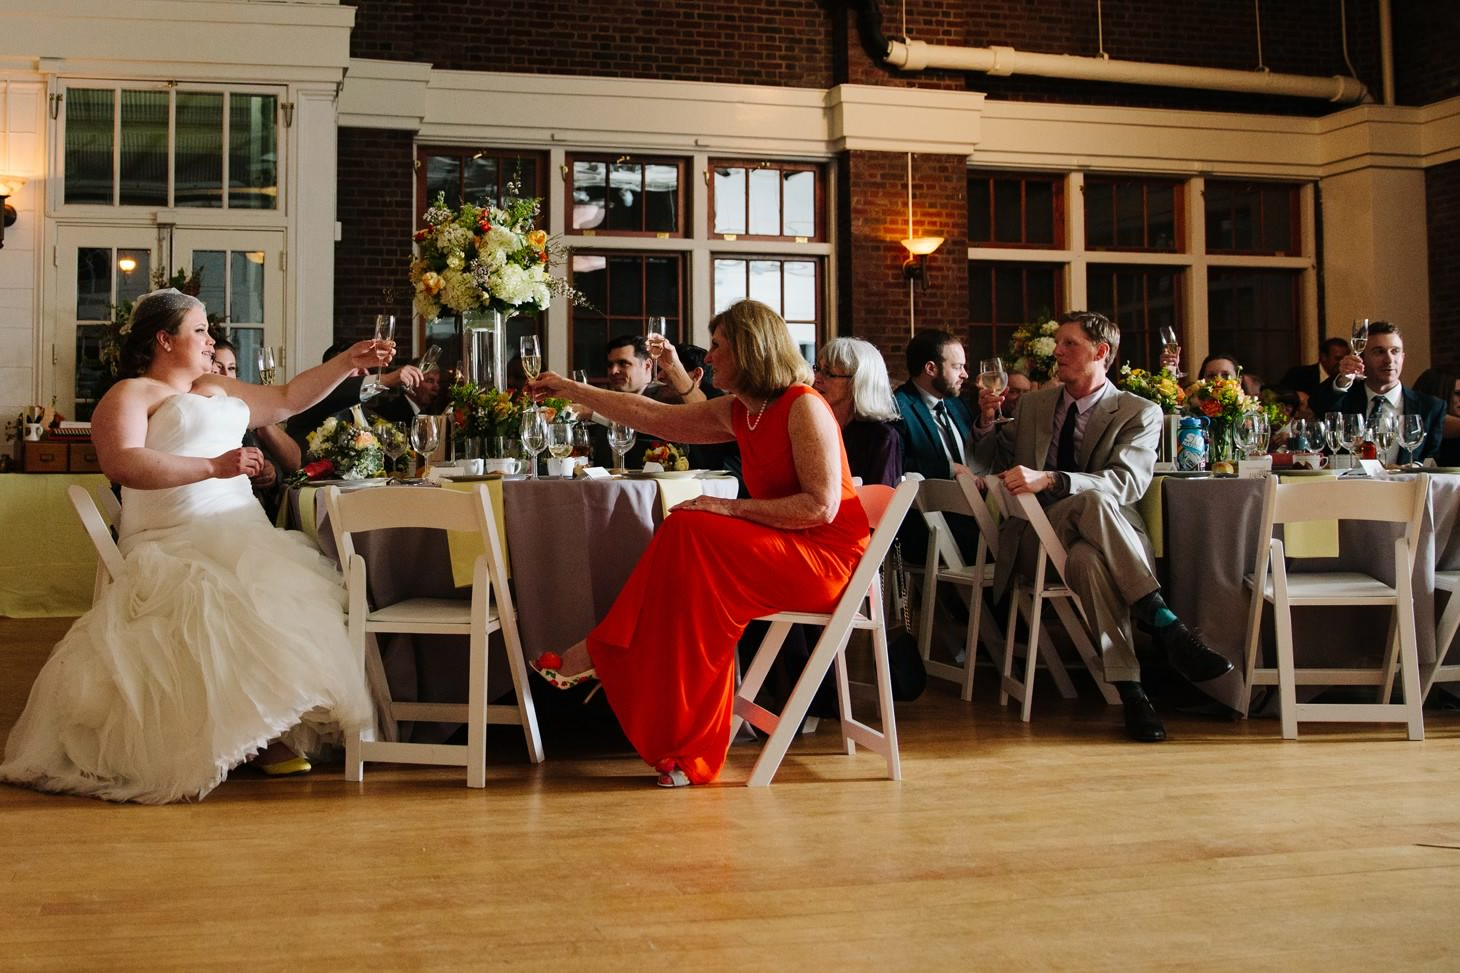 nyc-brooklyn-prospect-park-picnic-house-wedding-smitten-chickens-nerdy-62.jpg